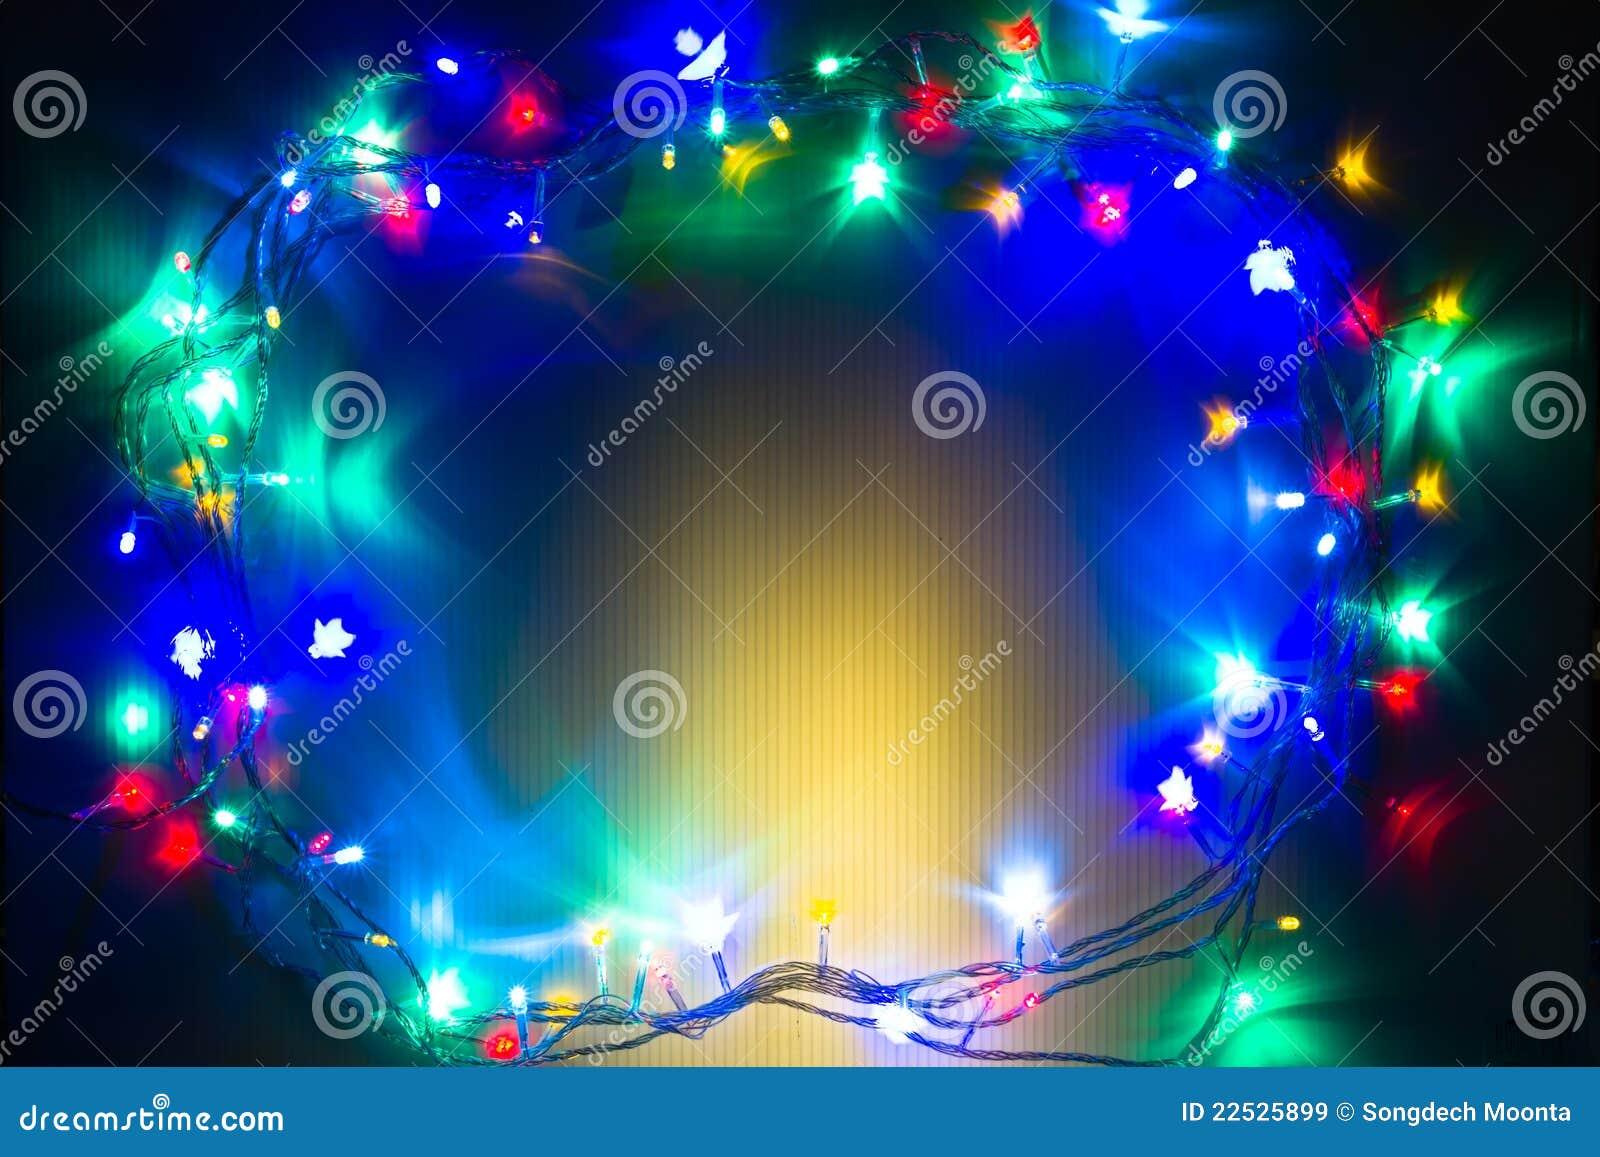 weihnachten led beleuchtet feld lizenzfreie stockbilder bild 22525899. Black Bedroom Furniture Sets. Home Design Ideas